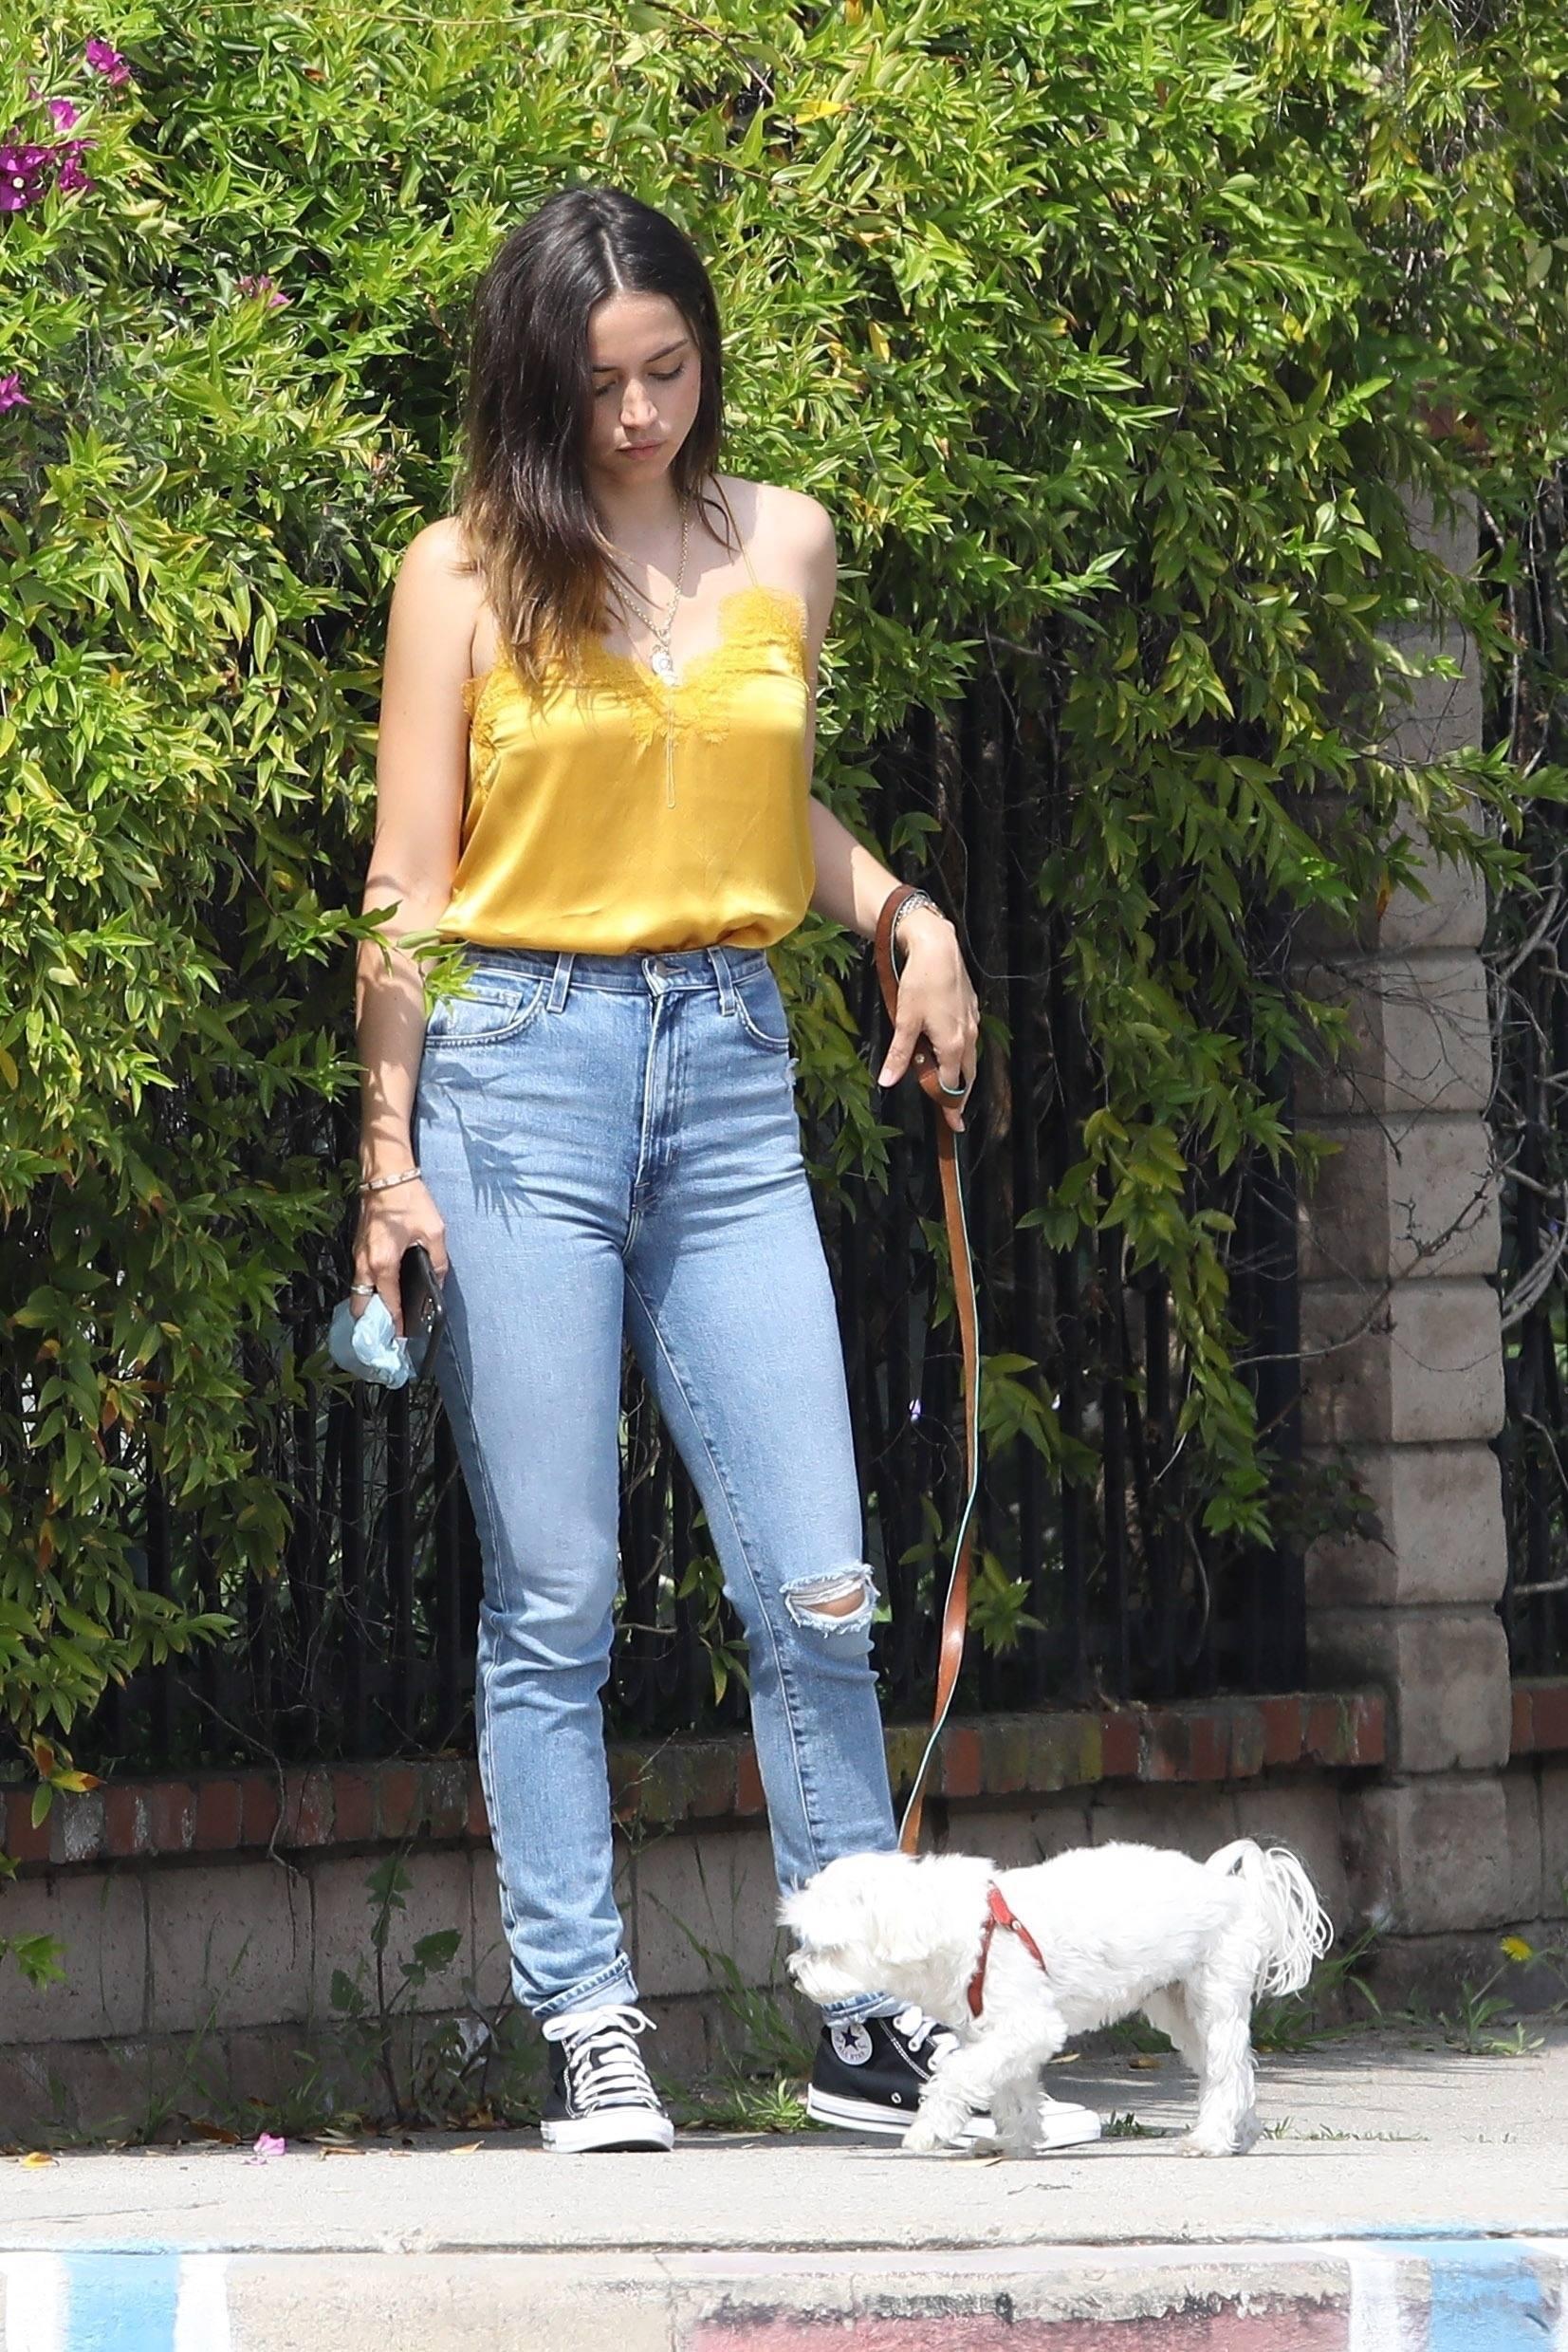 Ana De Armas Beautiful In Tight Jeans